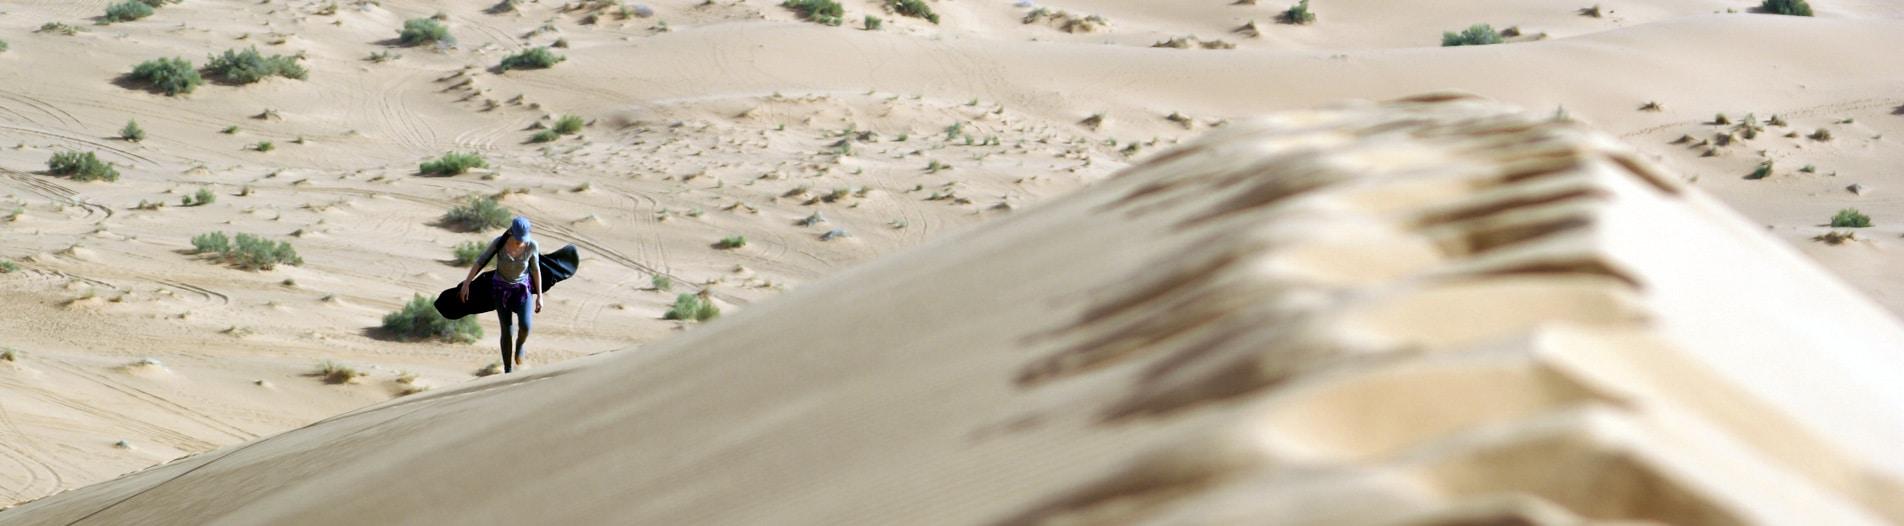 trekking on Dunes